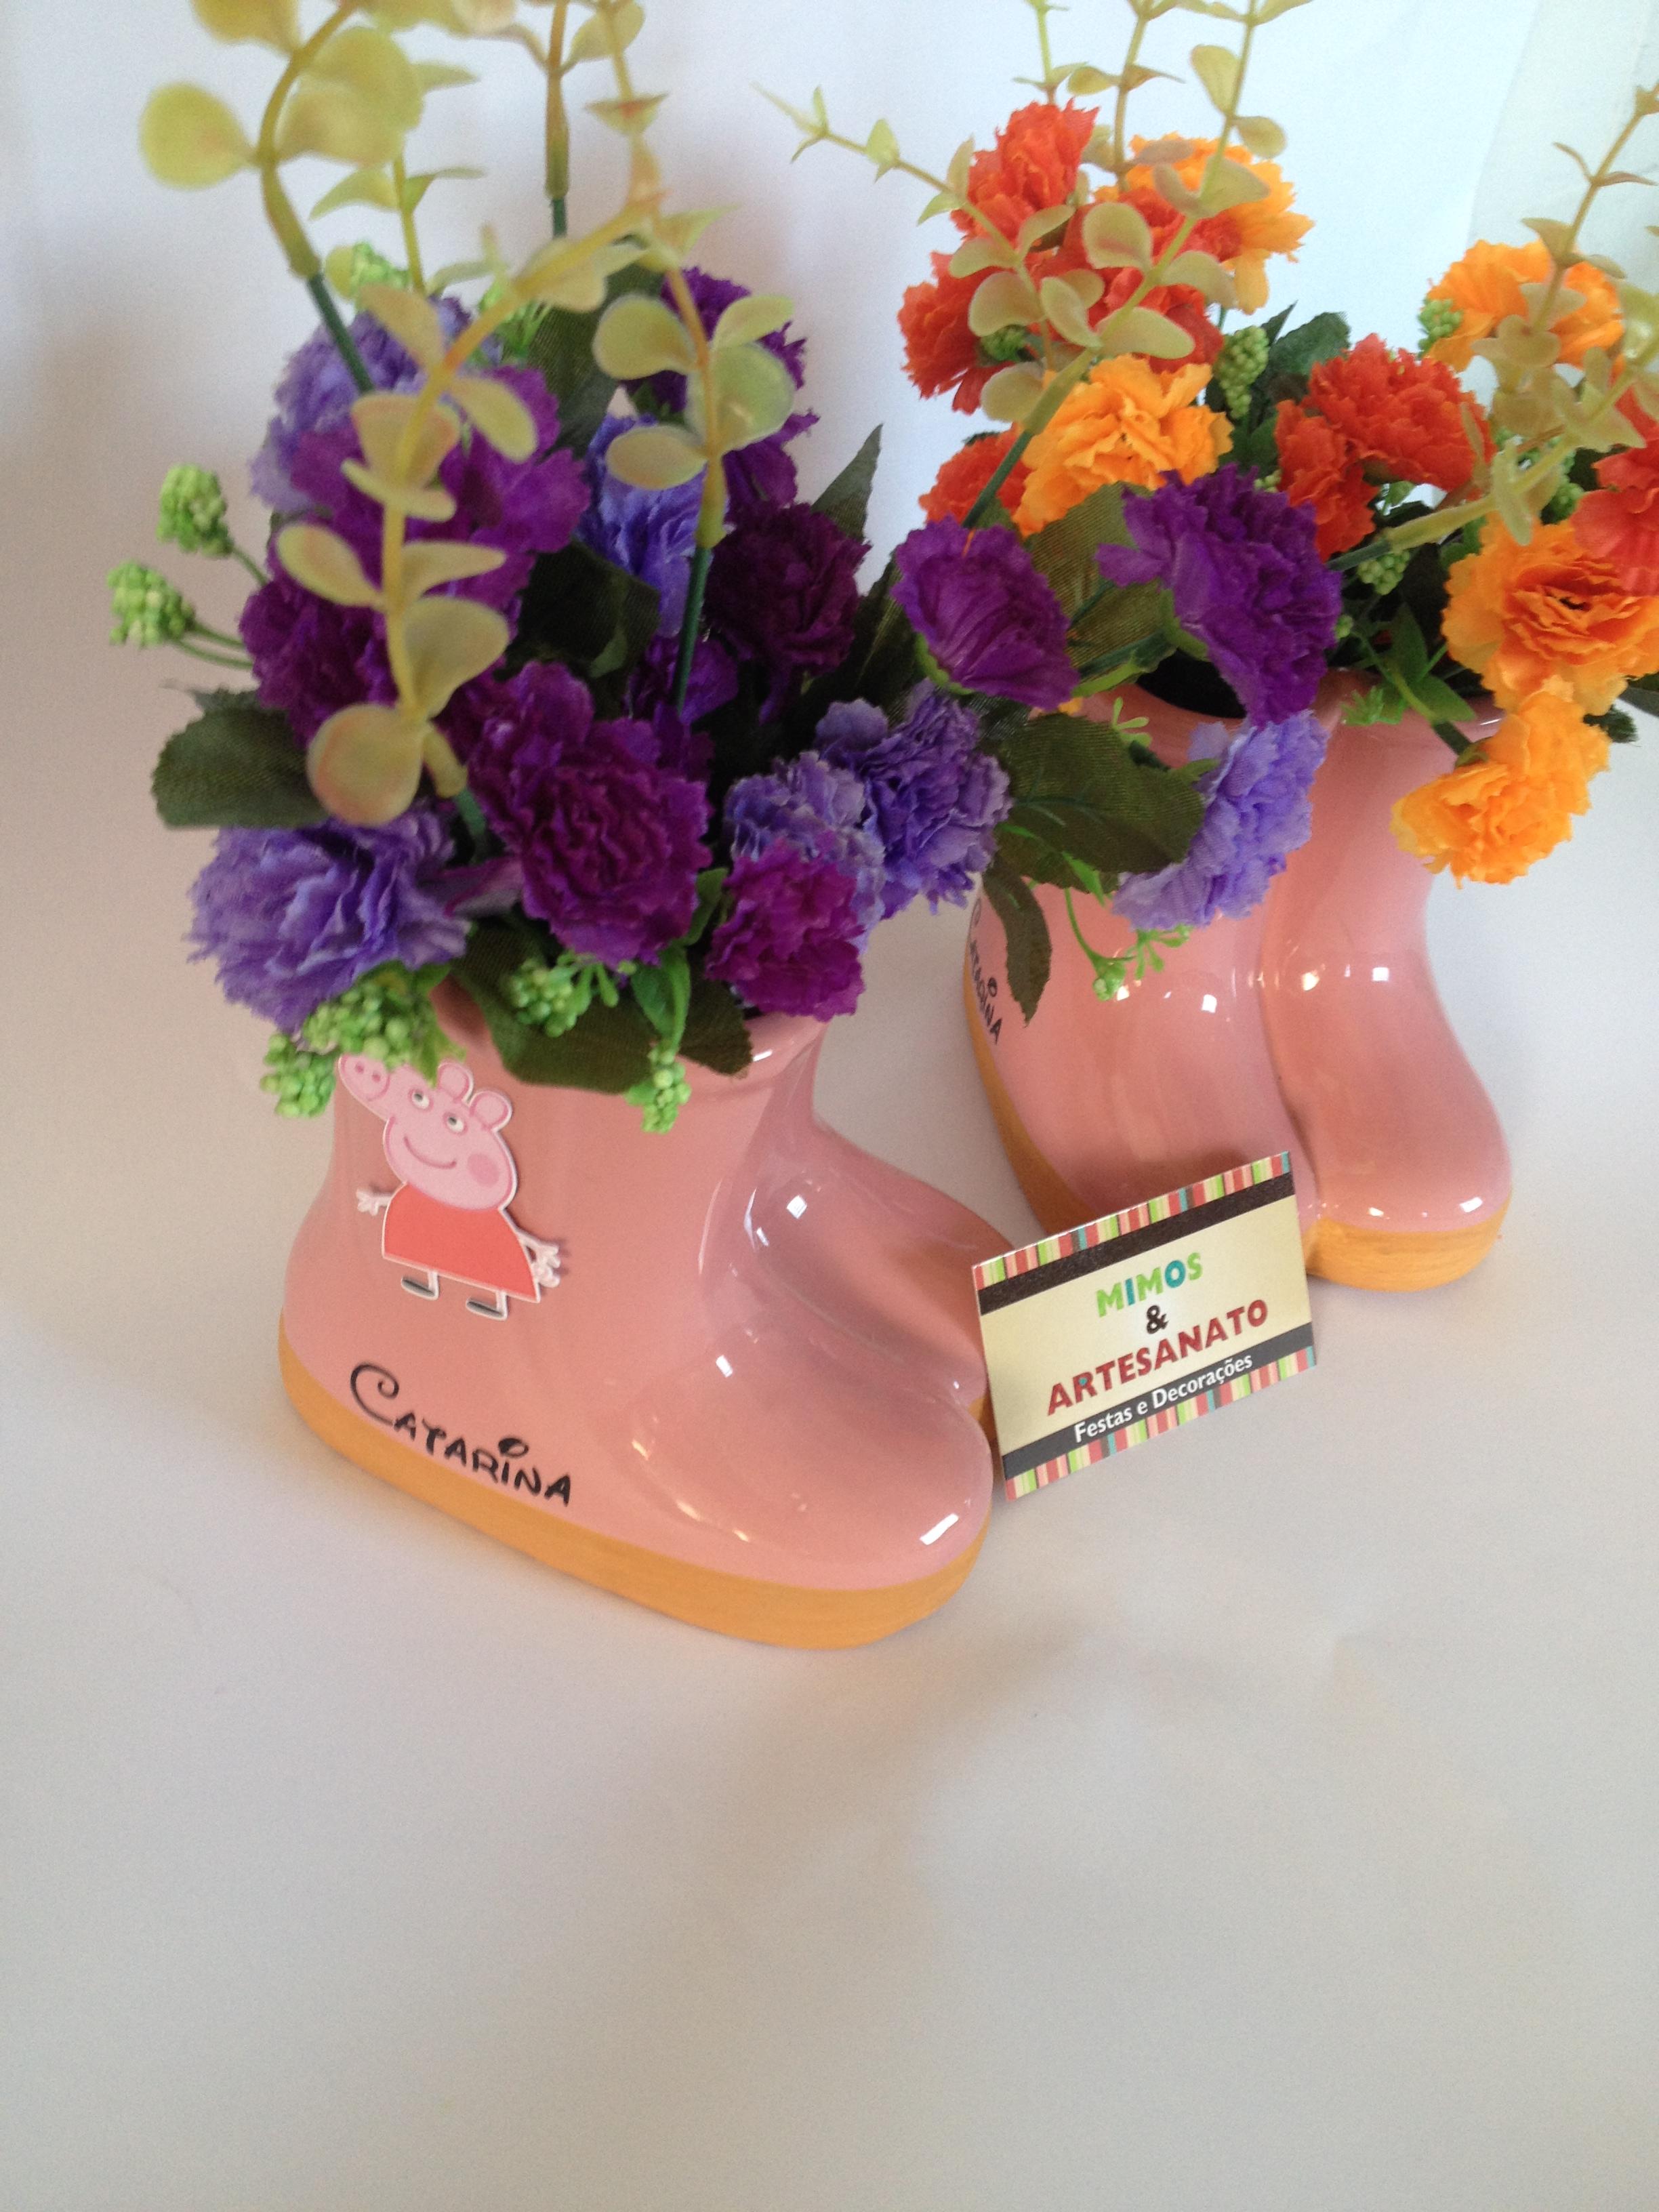 Bota peppa pig mimos artesanato elo7 for Marcas de vajillas de porcelana